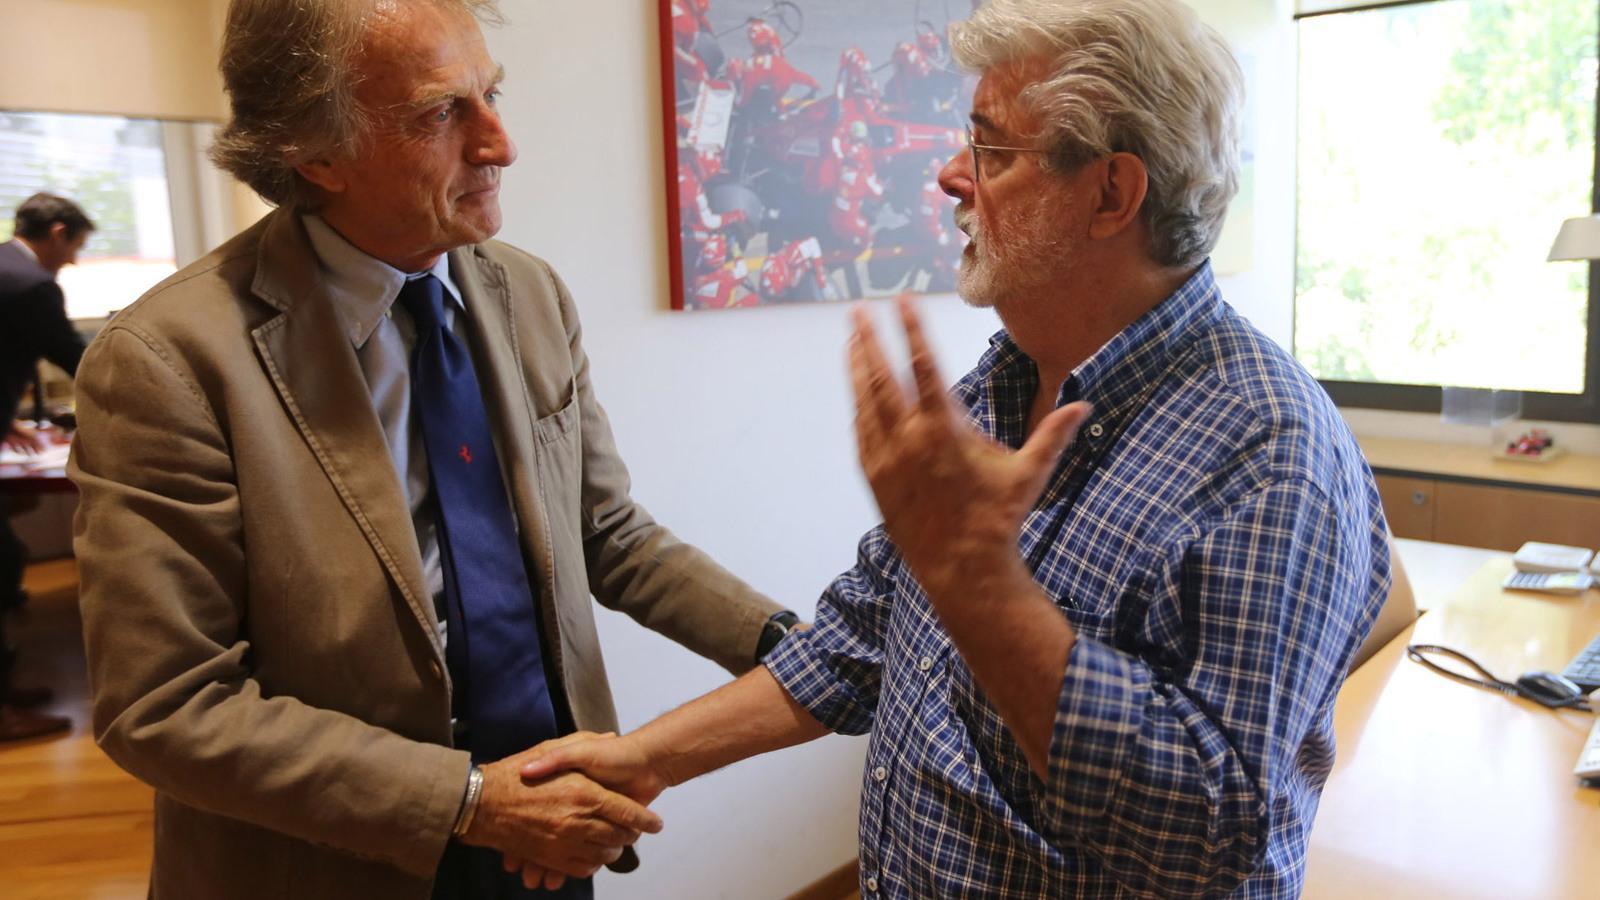 Luca di Montezemolo and George Lucas